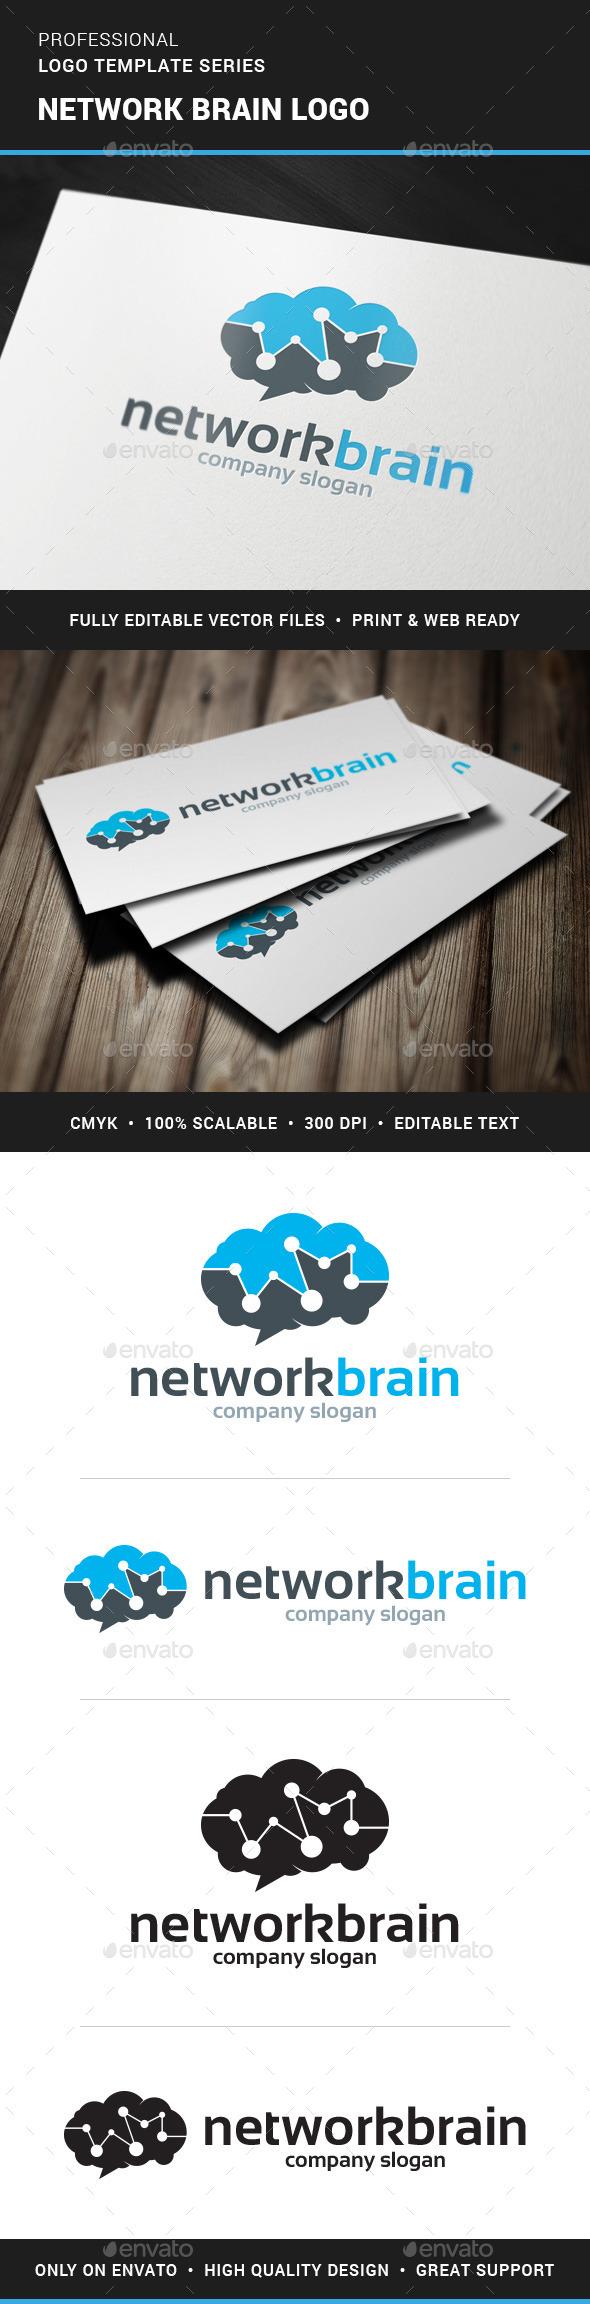 Network Brain Logo Template